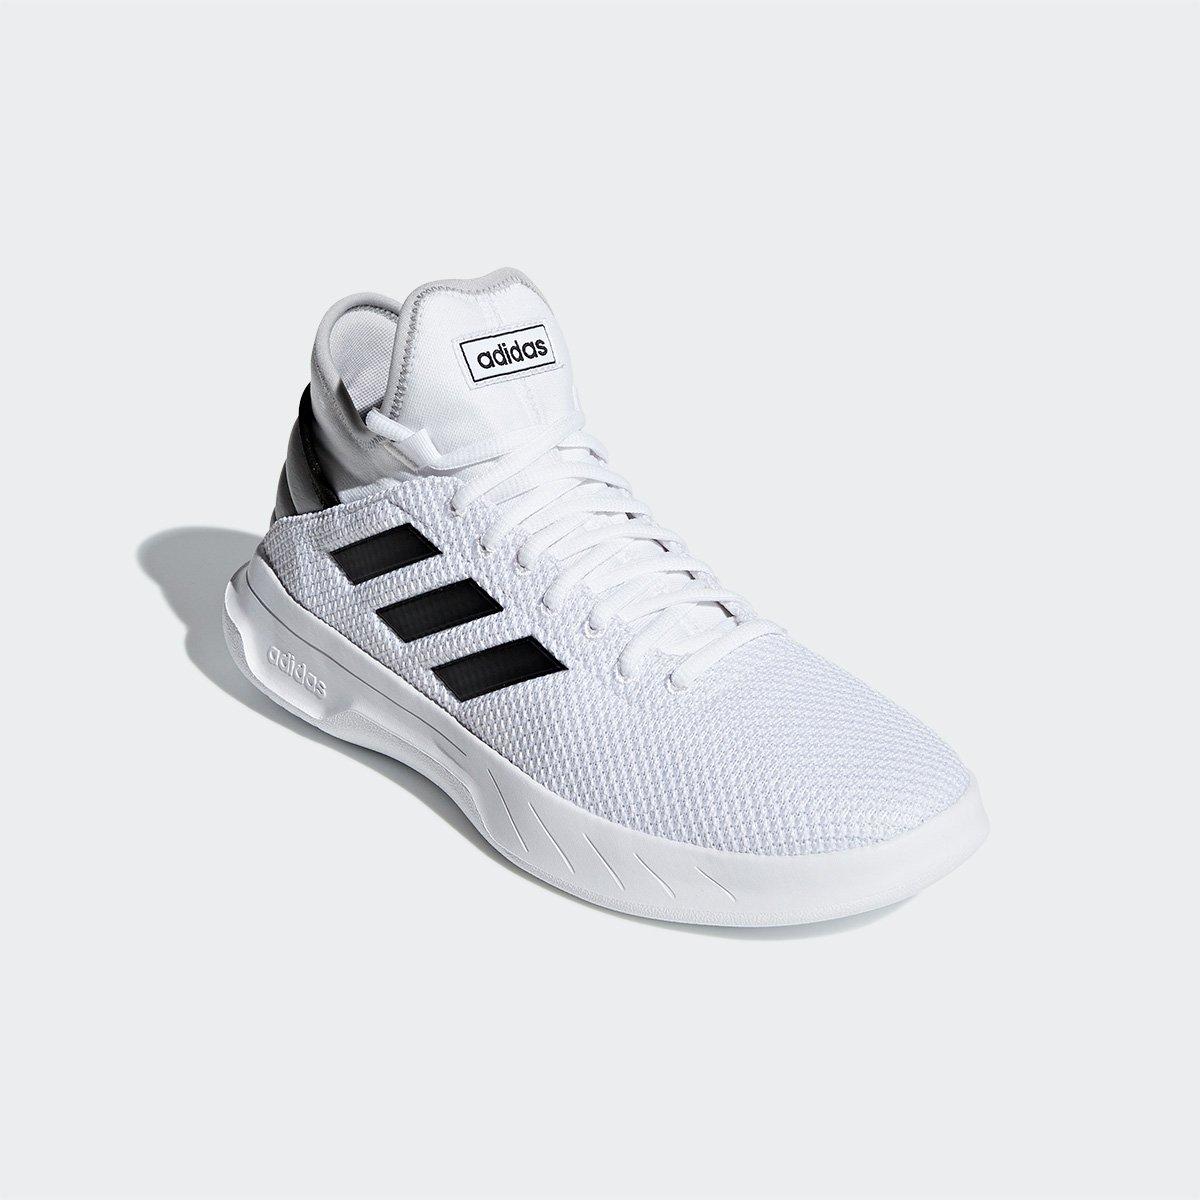 1cc8c5252 Tênis Adidas Fusion Storm Masculino - Branco e Cinza | Loja NBA